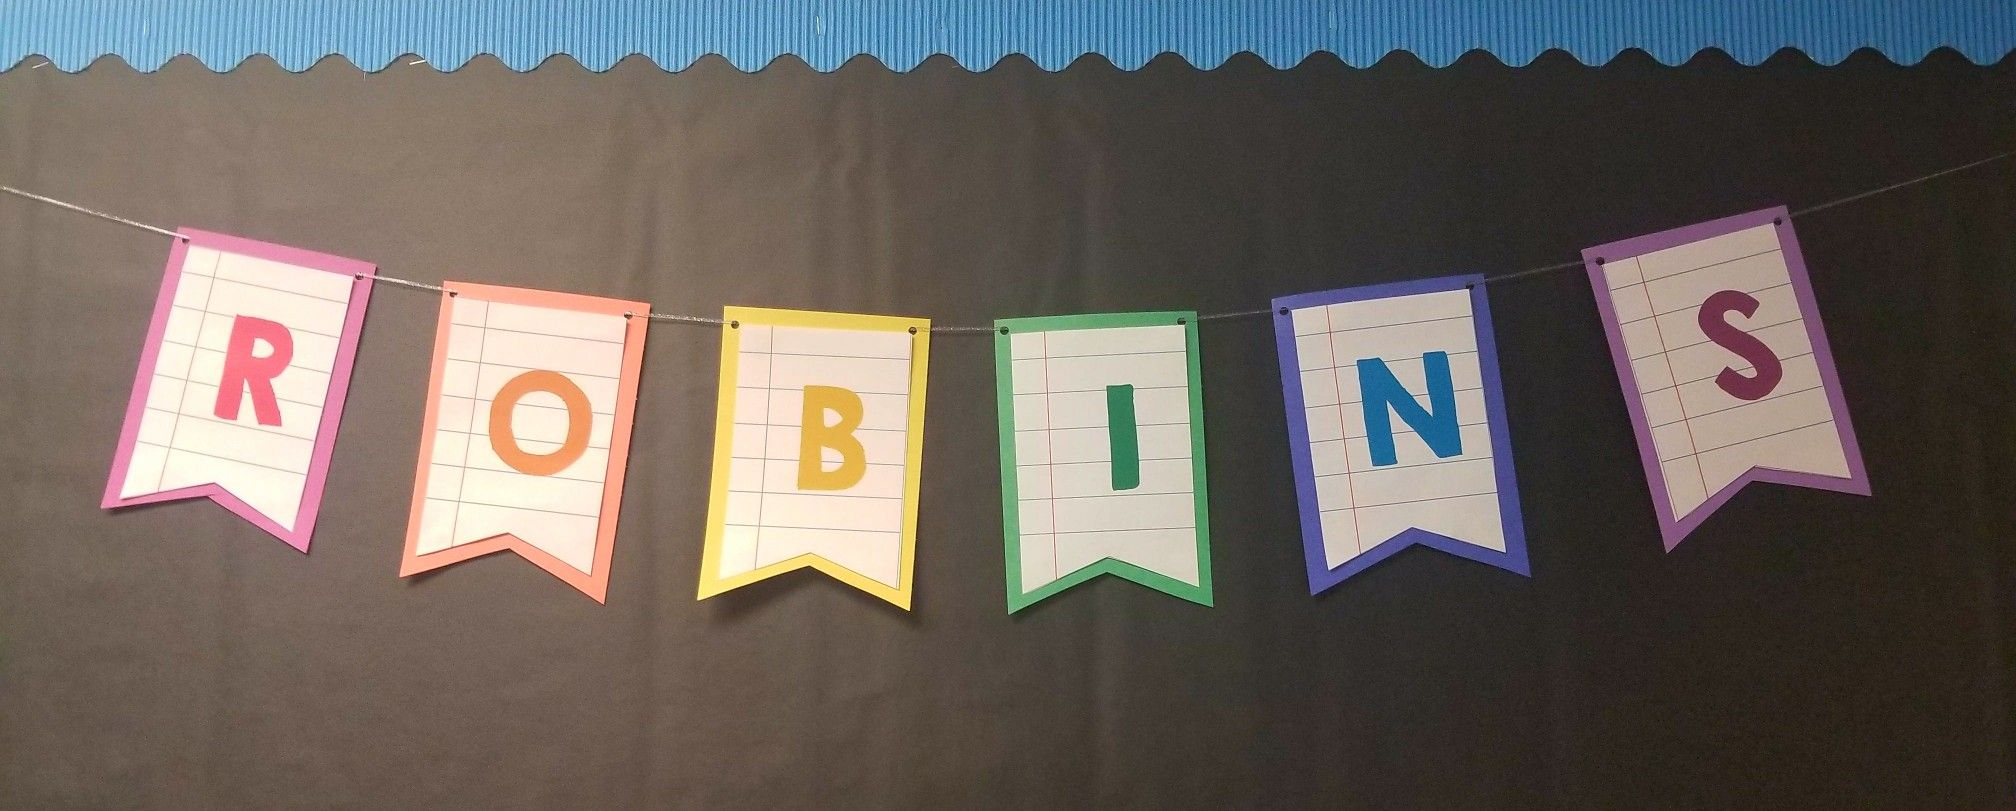 back to school banner robins 2017 2018 pinterest